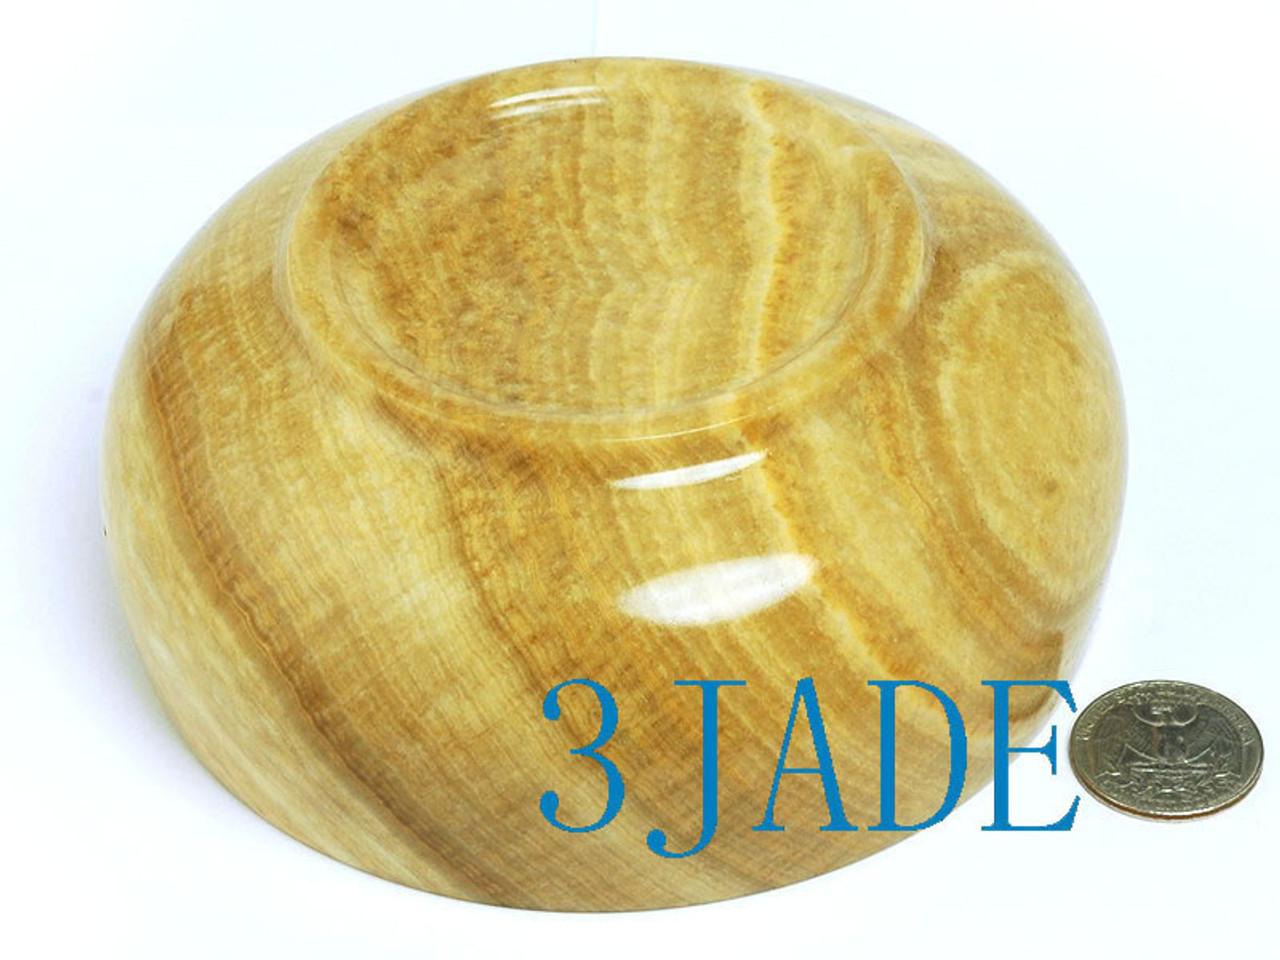 grainstone vessel